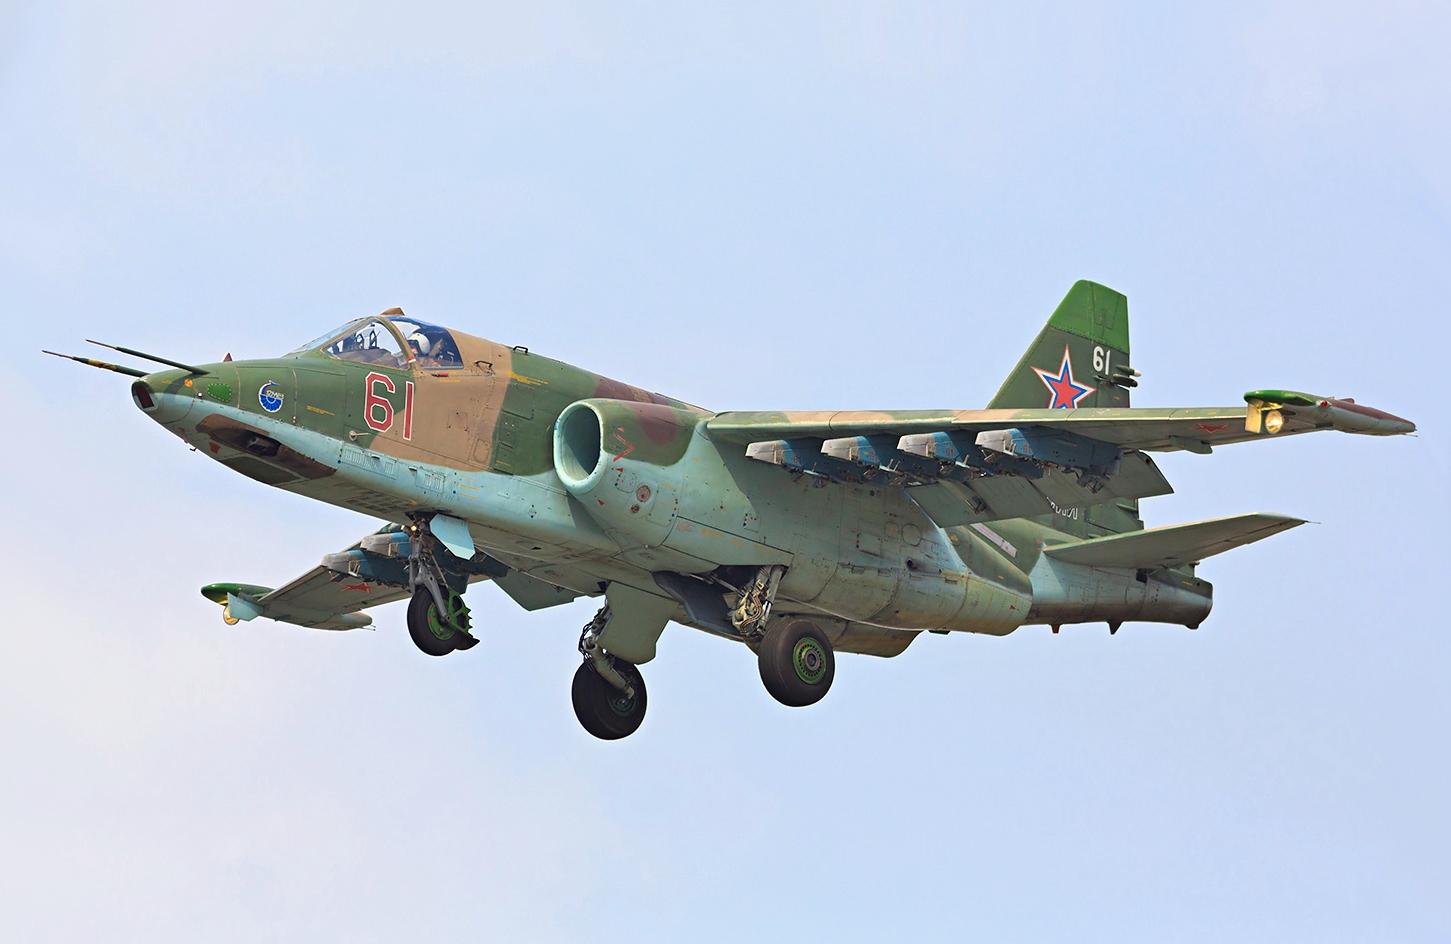 Sukhoi Su-25 - Wikipedia